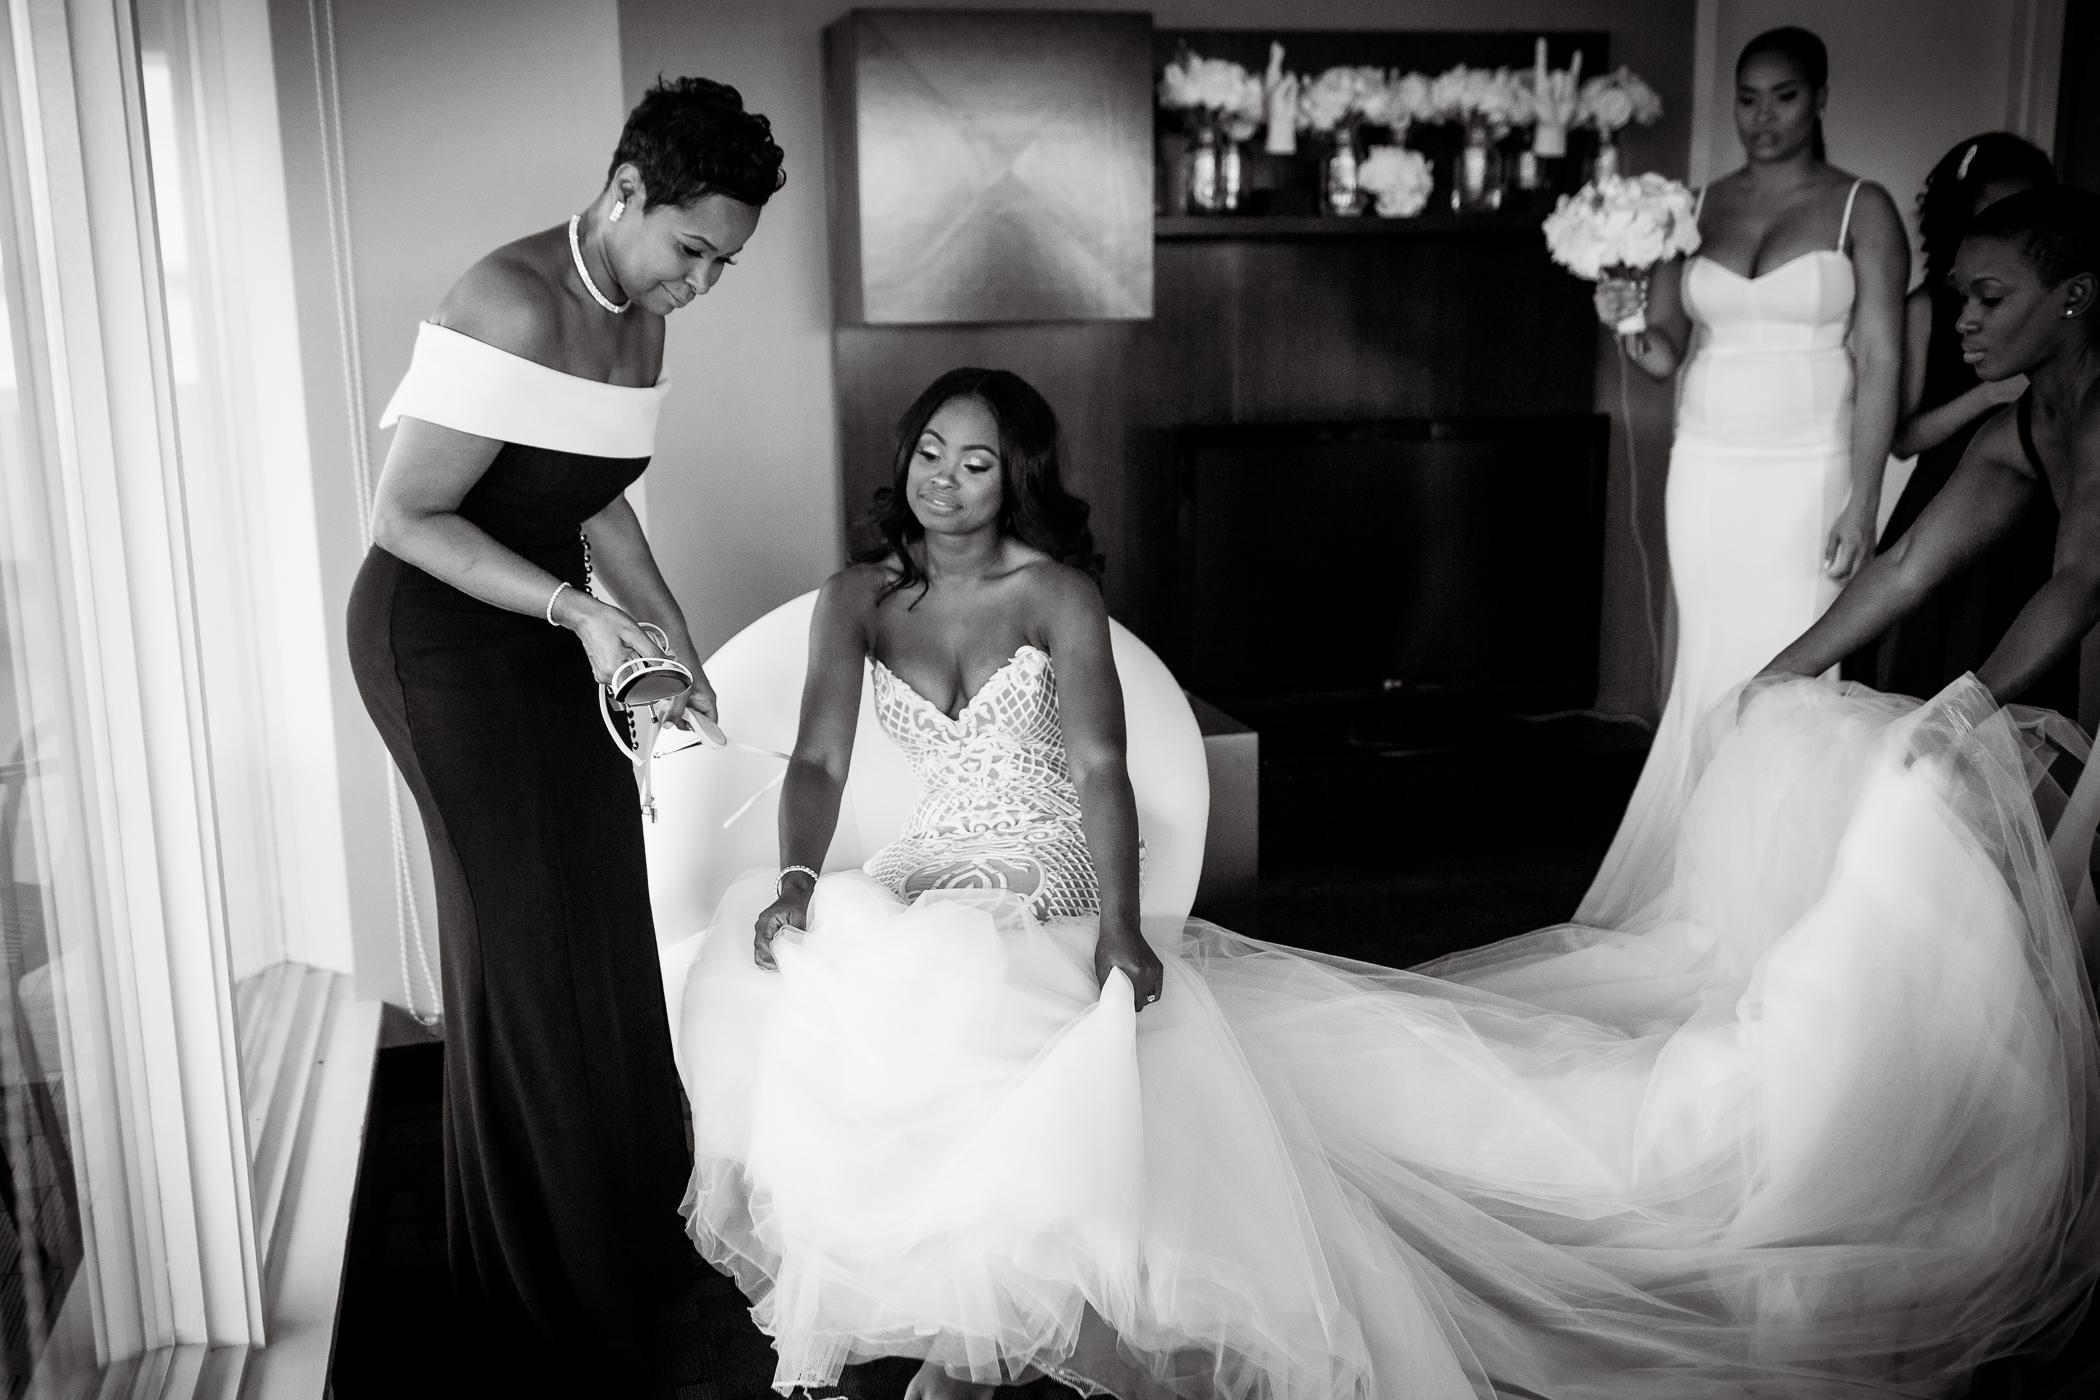 Vainglorious_Brides_Shaq_Drew_wedding_Petronella_Photography_8.jpg